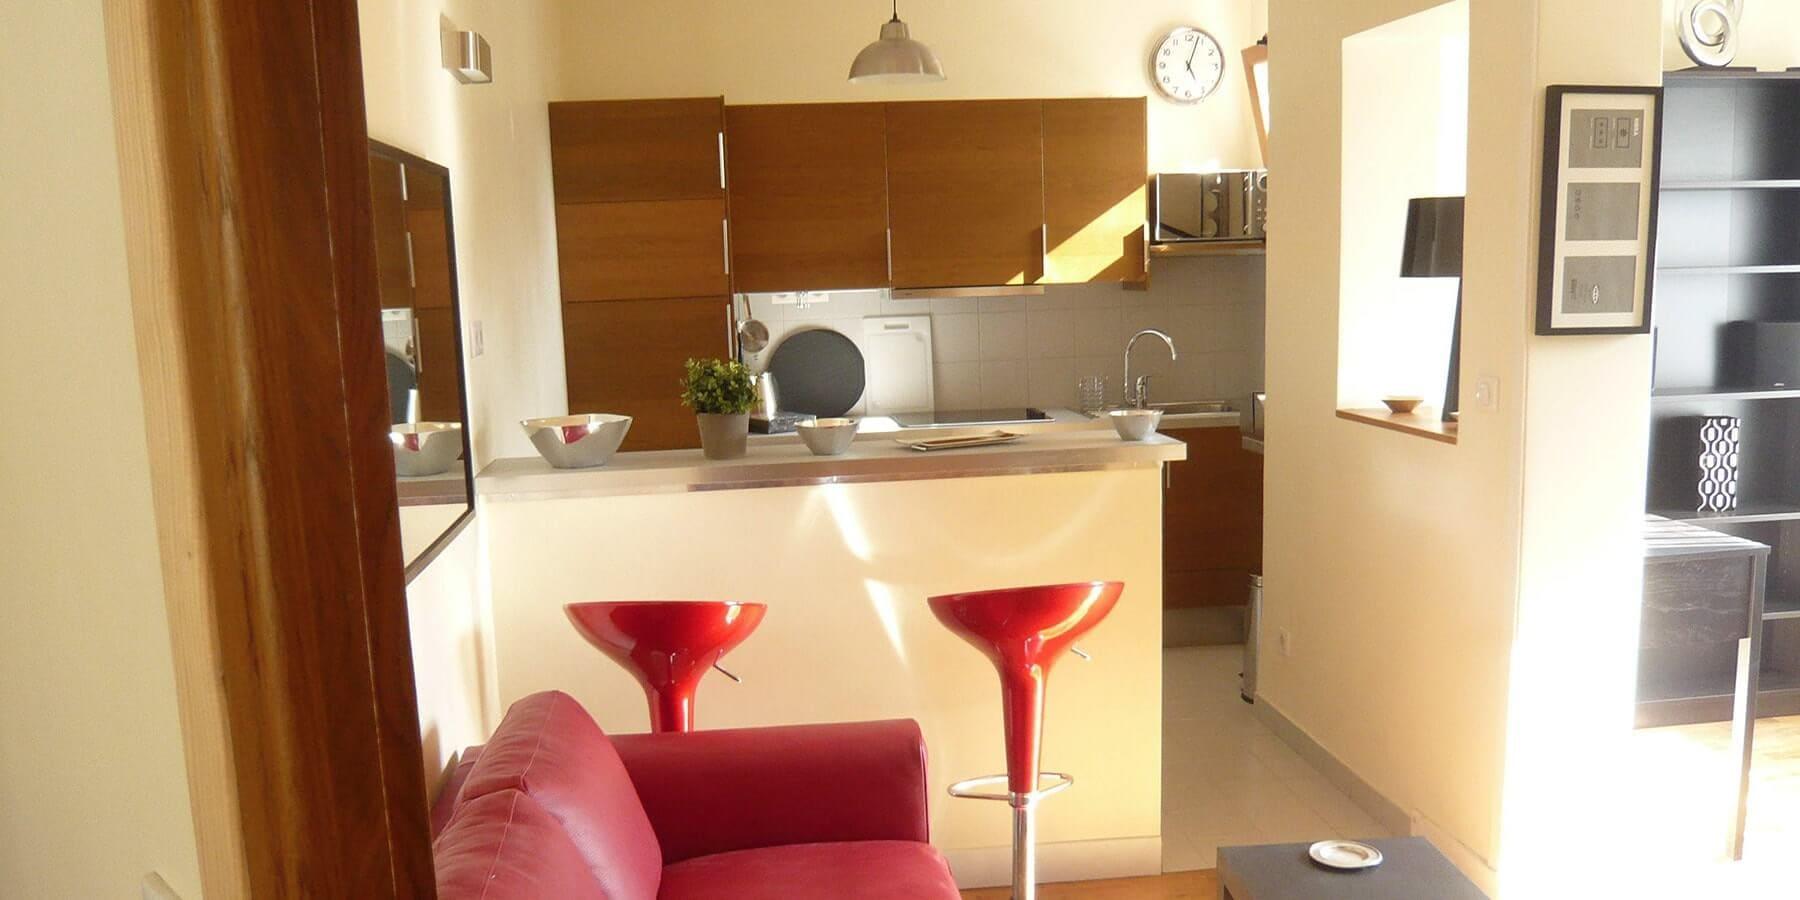 location appartement et studio meubl versailles amvgp. Black Bedroom Furniture Sets. Home Design Ideas